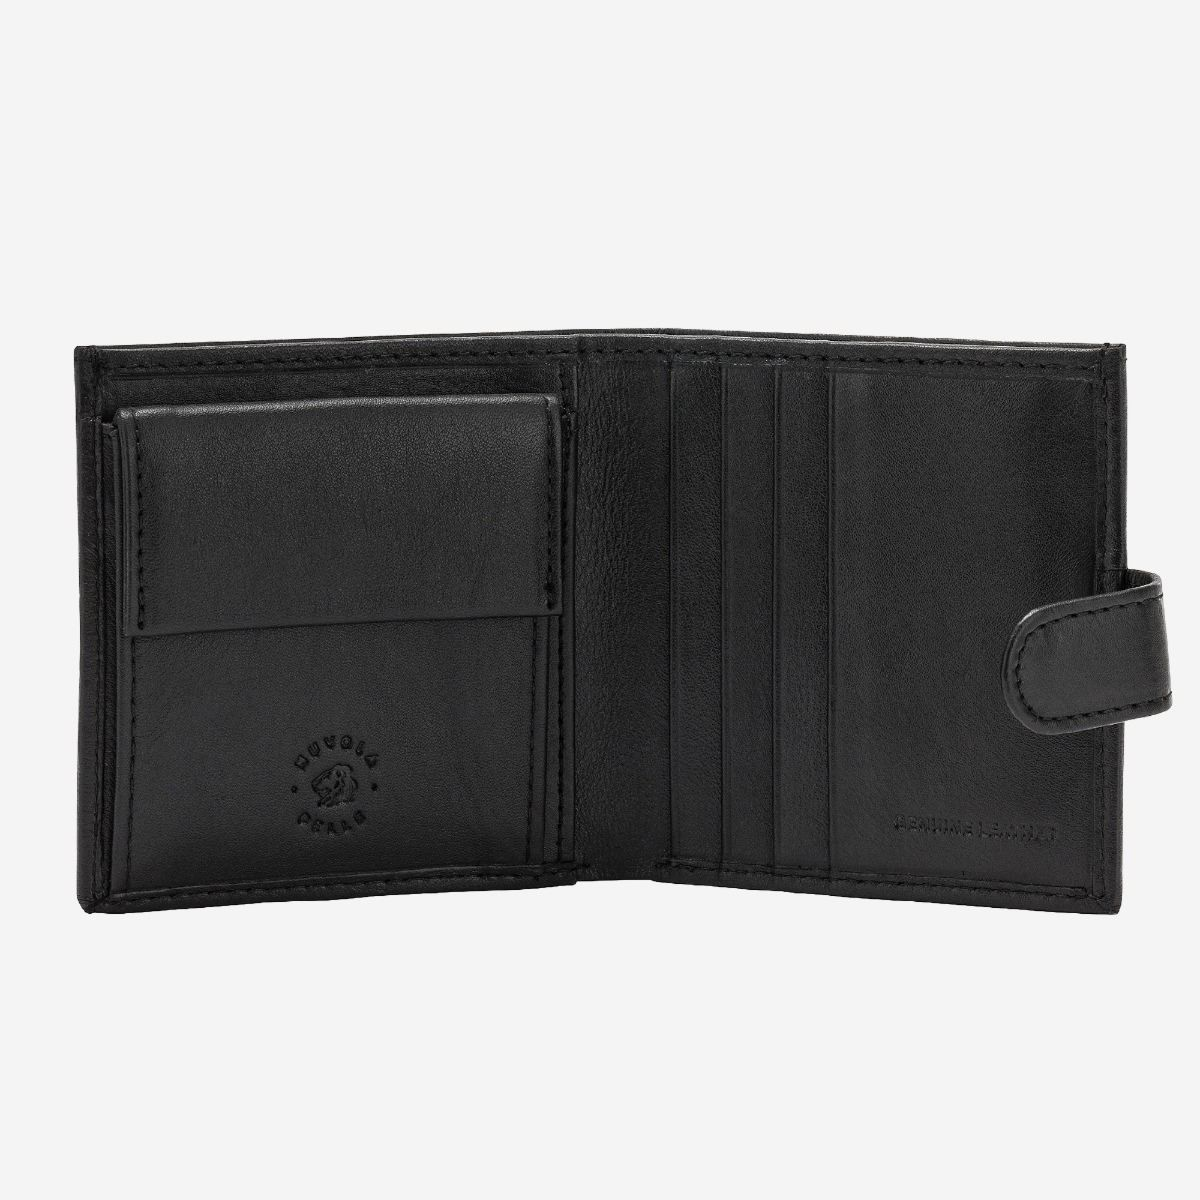 NUVOLA PELLE ארנק עור קלאסי עם תא למטבעות וסוגר - שחור